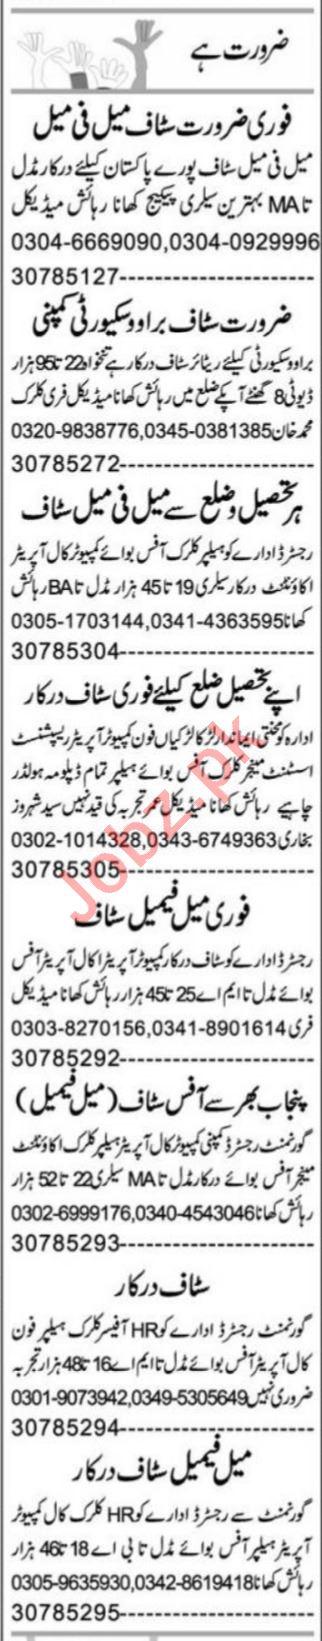 Express Sunday Rahim Yar Khan Classified Ads 12 Sep 2021